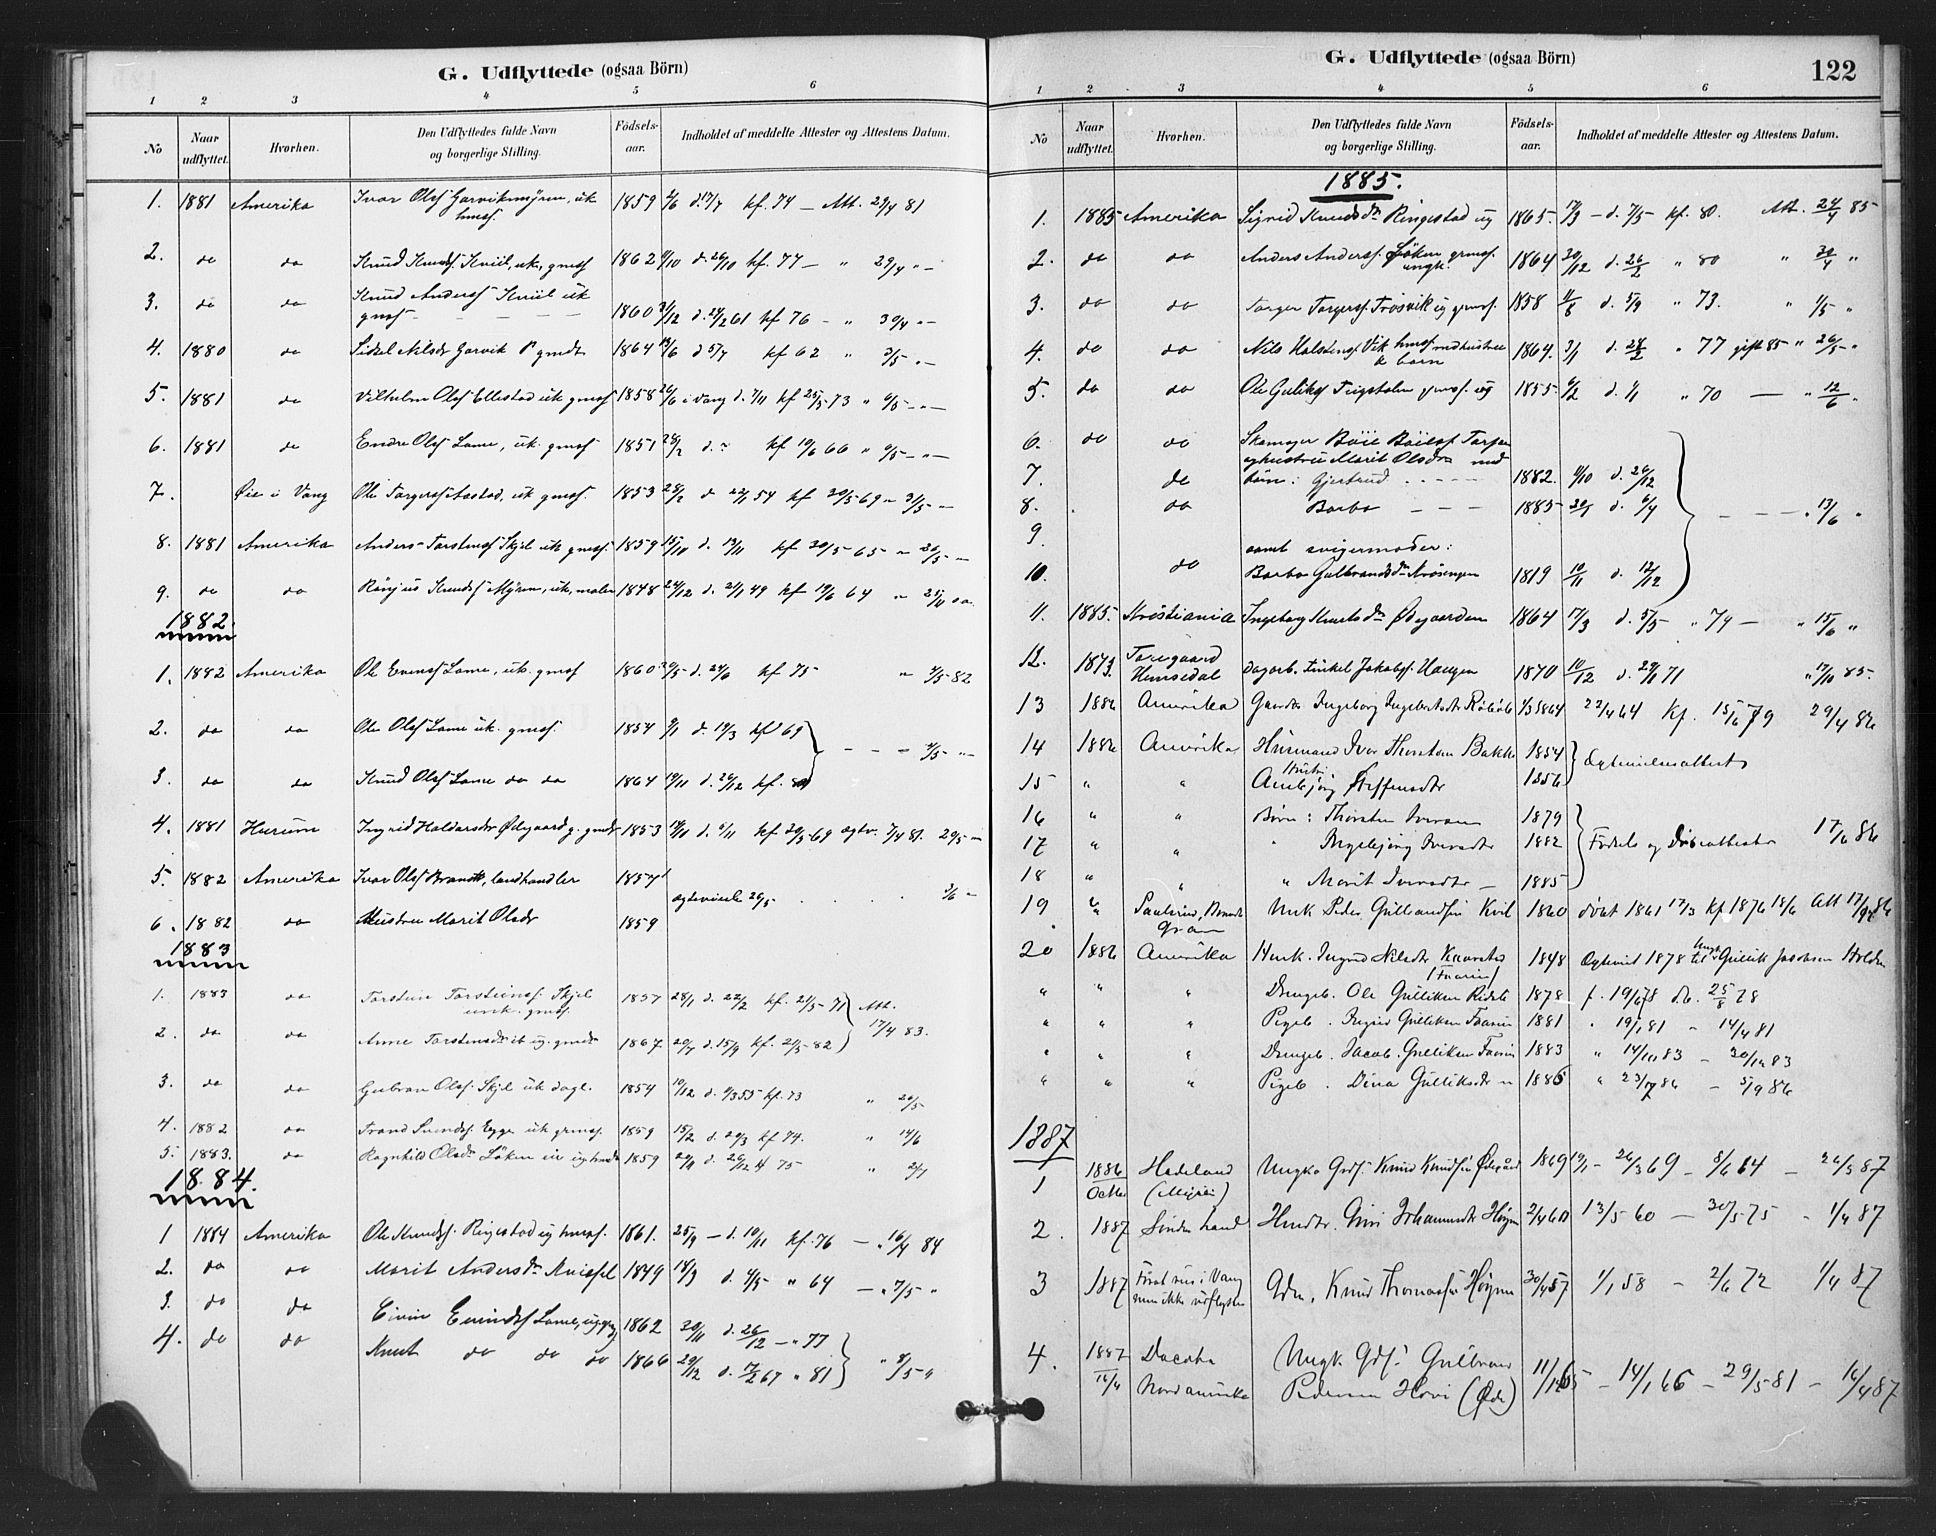 SAH, Vestre Slidre prestekontor, Klokkerbok nr. 6, 1881-1915, s. 122